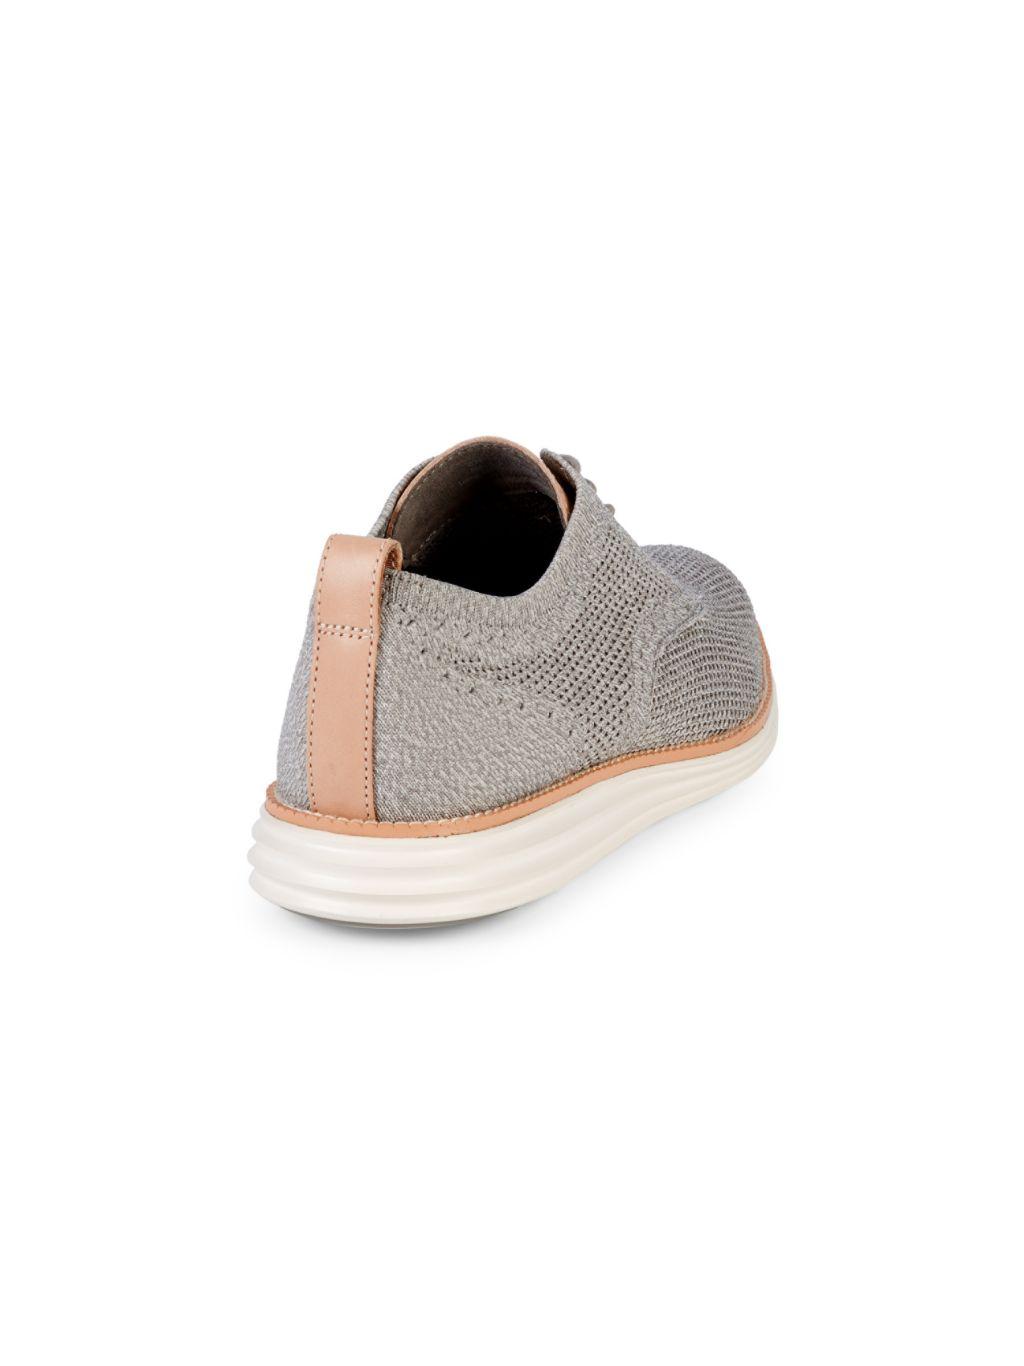 Cole Haan Original Grand Wingtip Stitchlite Derby Shoes